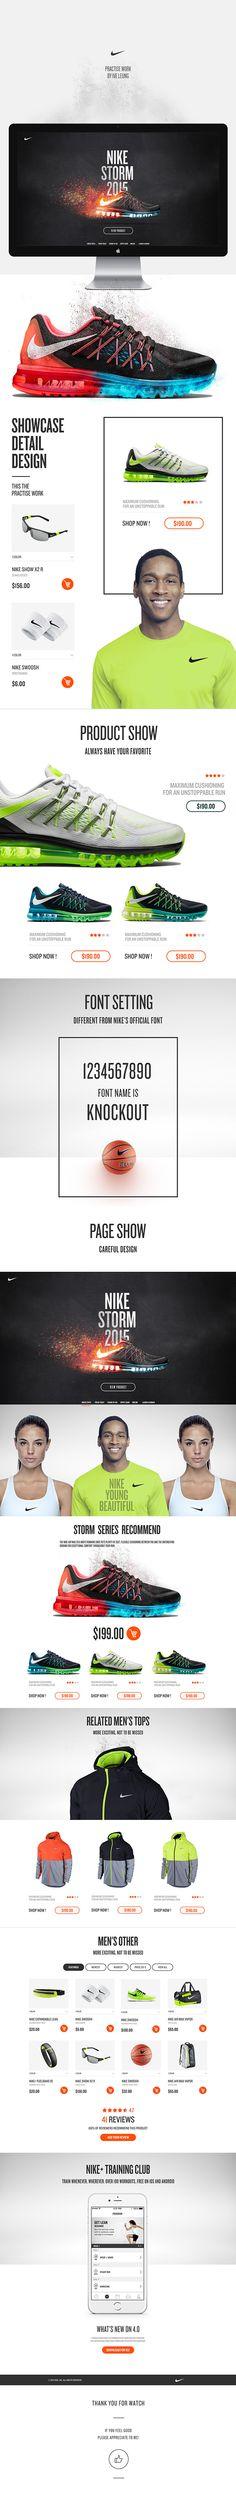 https://www.behance.net/gallery/23554239/Nike-practise-work